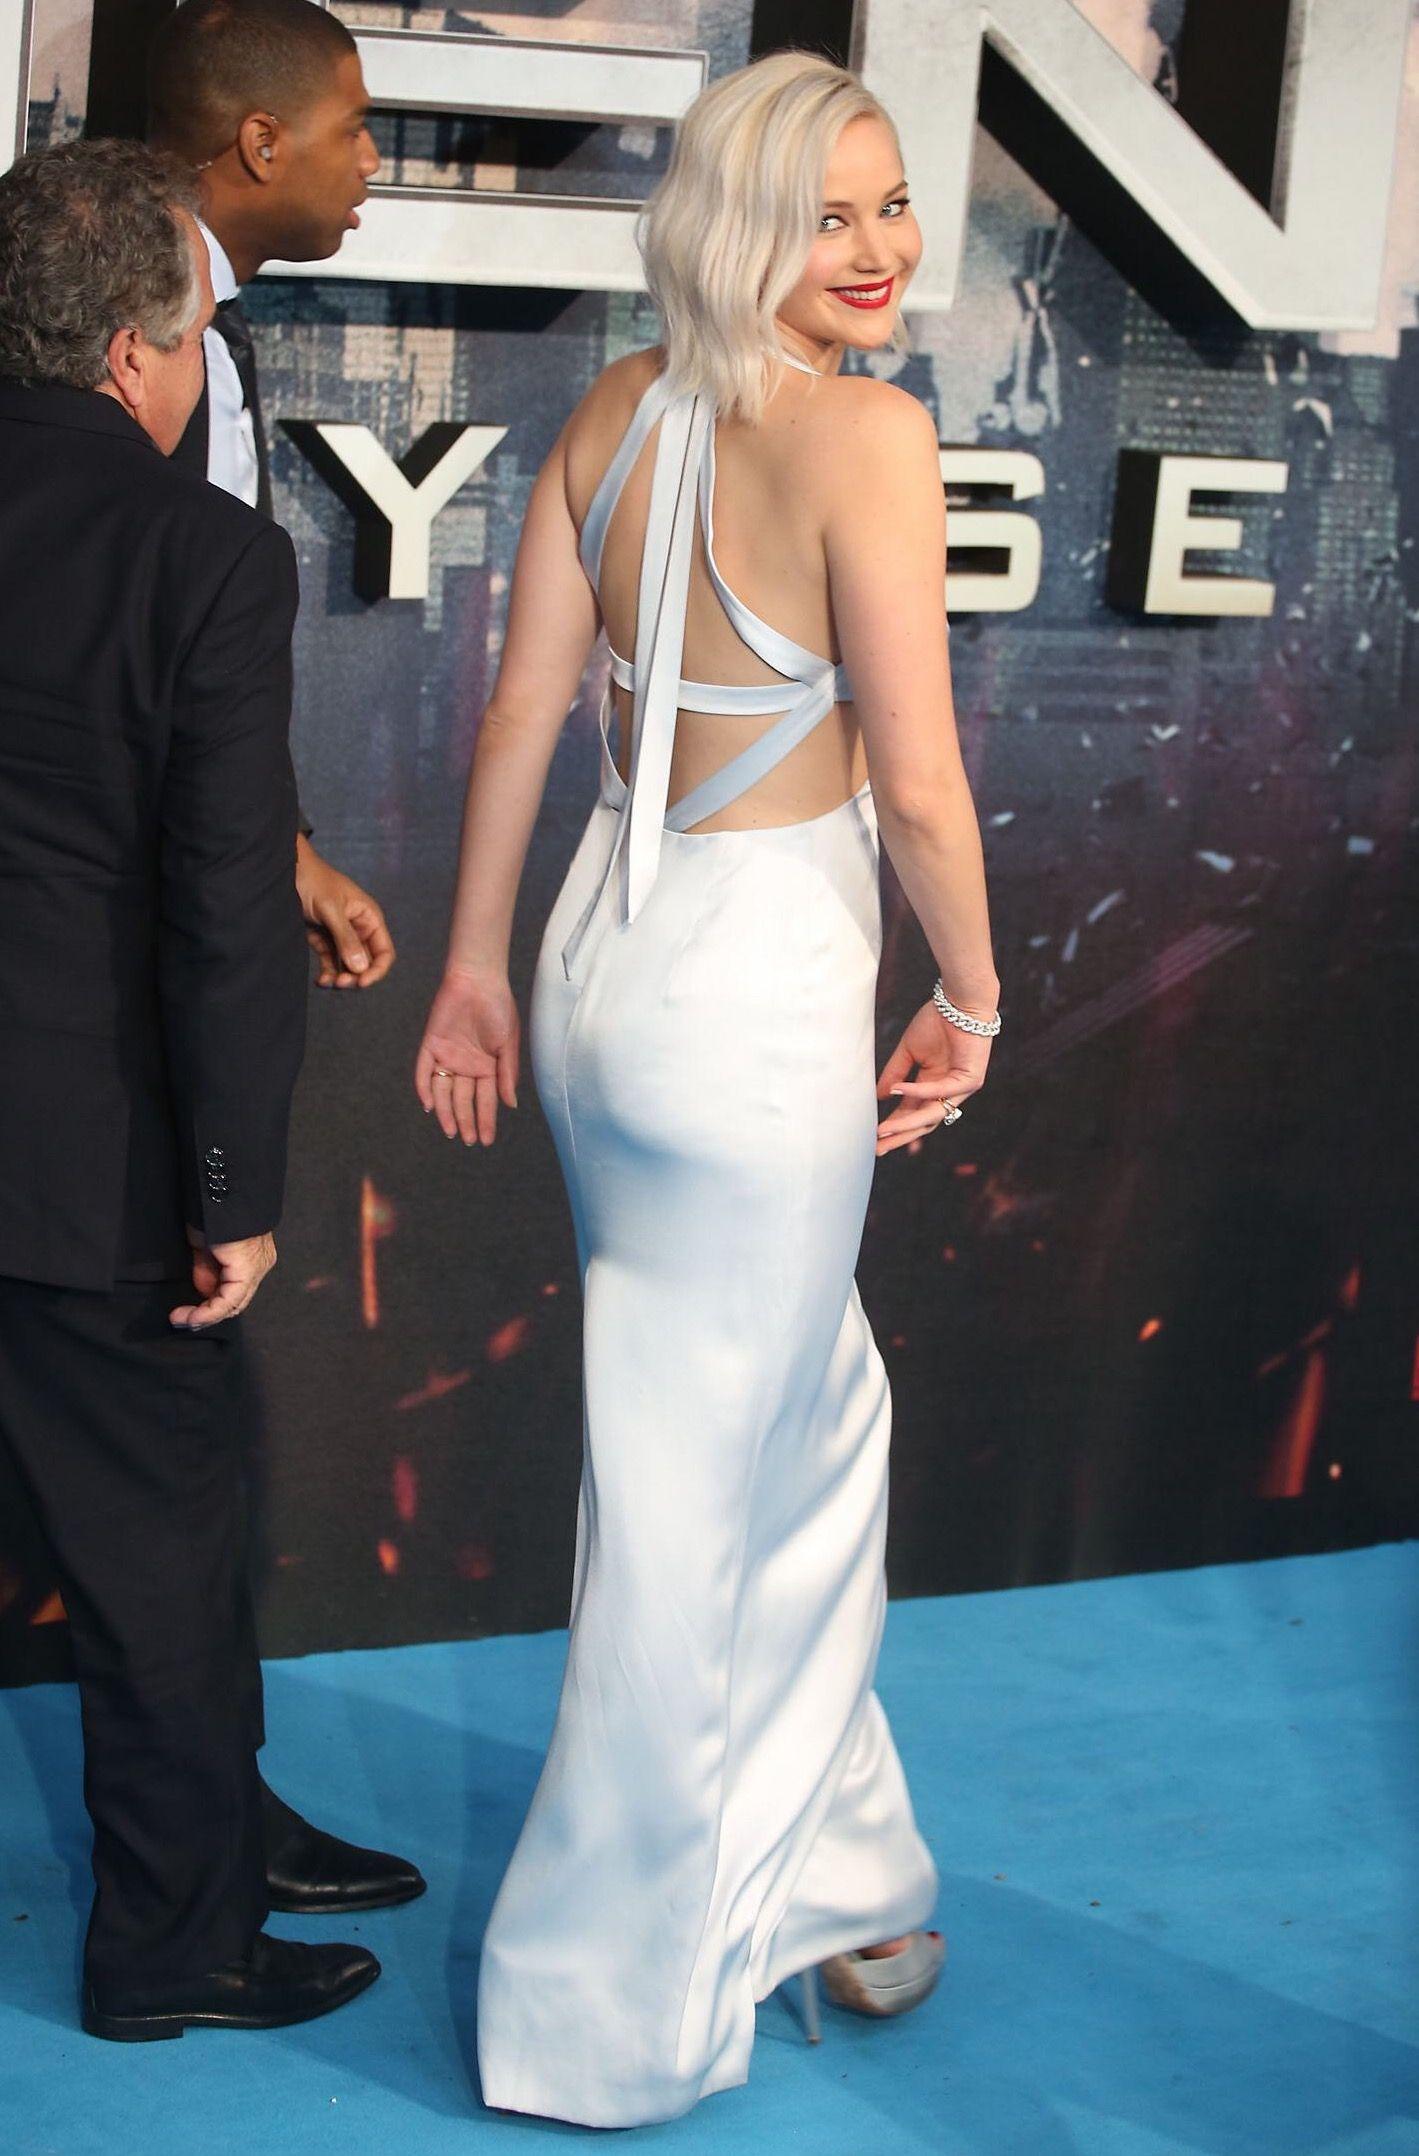 Jennifer Lawrence At The Premiere Of X Men Apocalypse In London 2016 Jennifer Lawrence Pics Jennifer Lawrence Karen Mcdougal